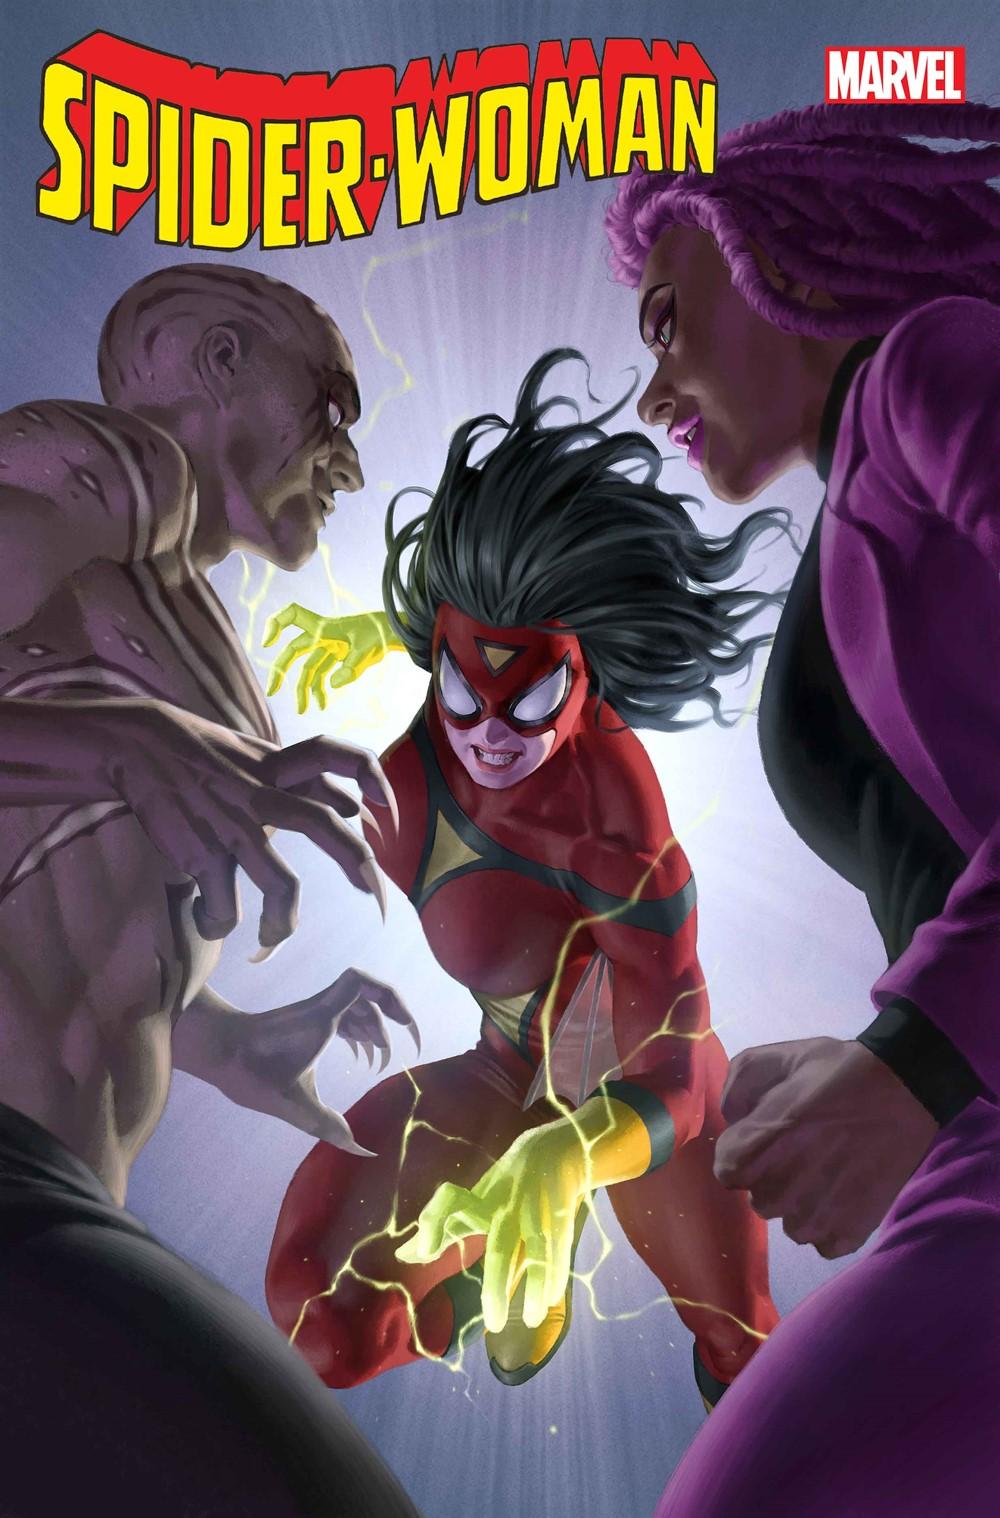 SPIDER-WOMAN_15_Yoon Marvel Comics September 2021 Solicitations